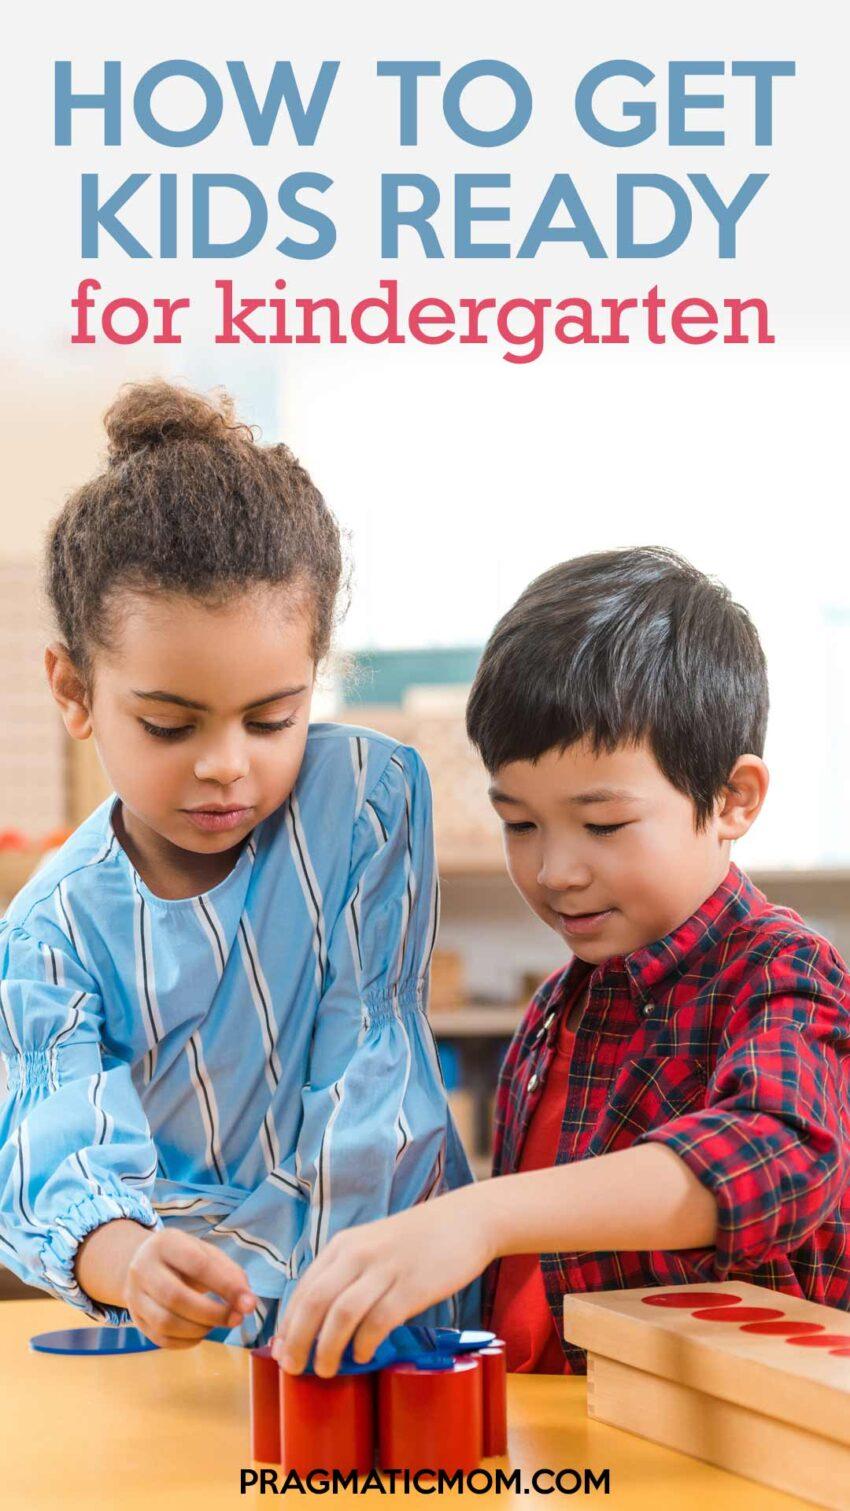 How to Get Kids Ready for Kindergarten